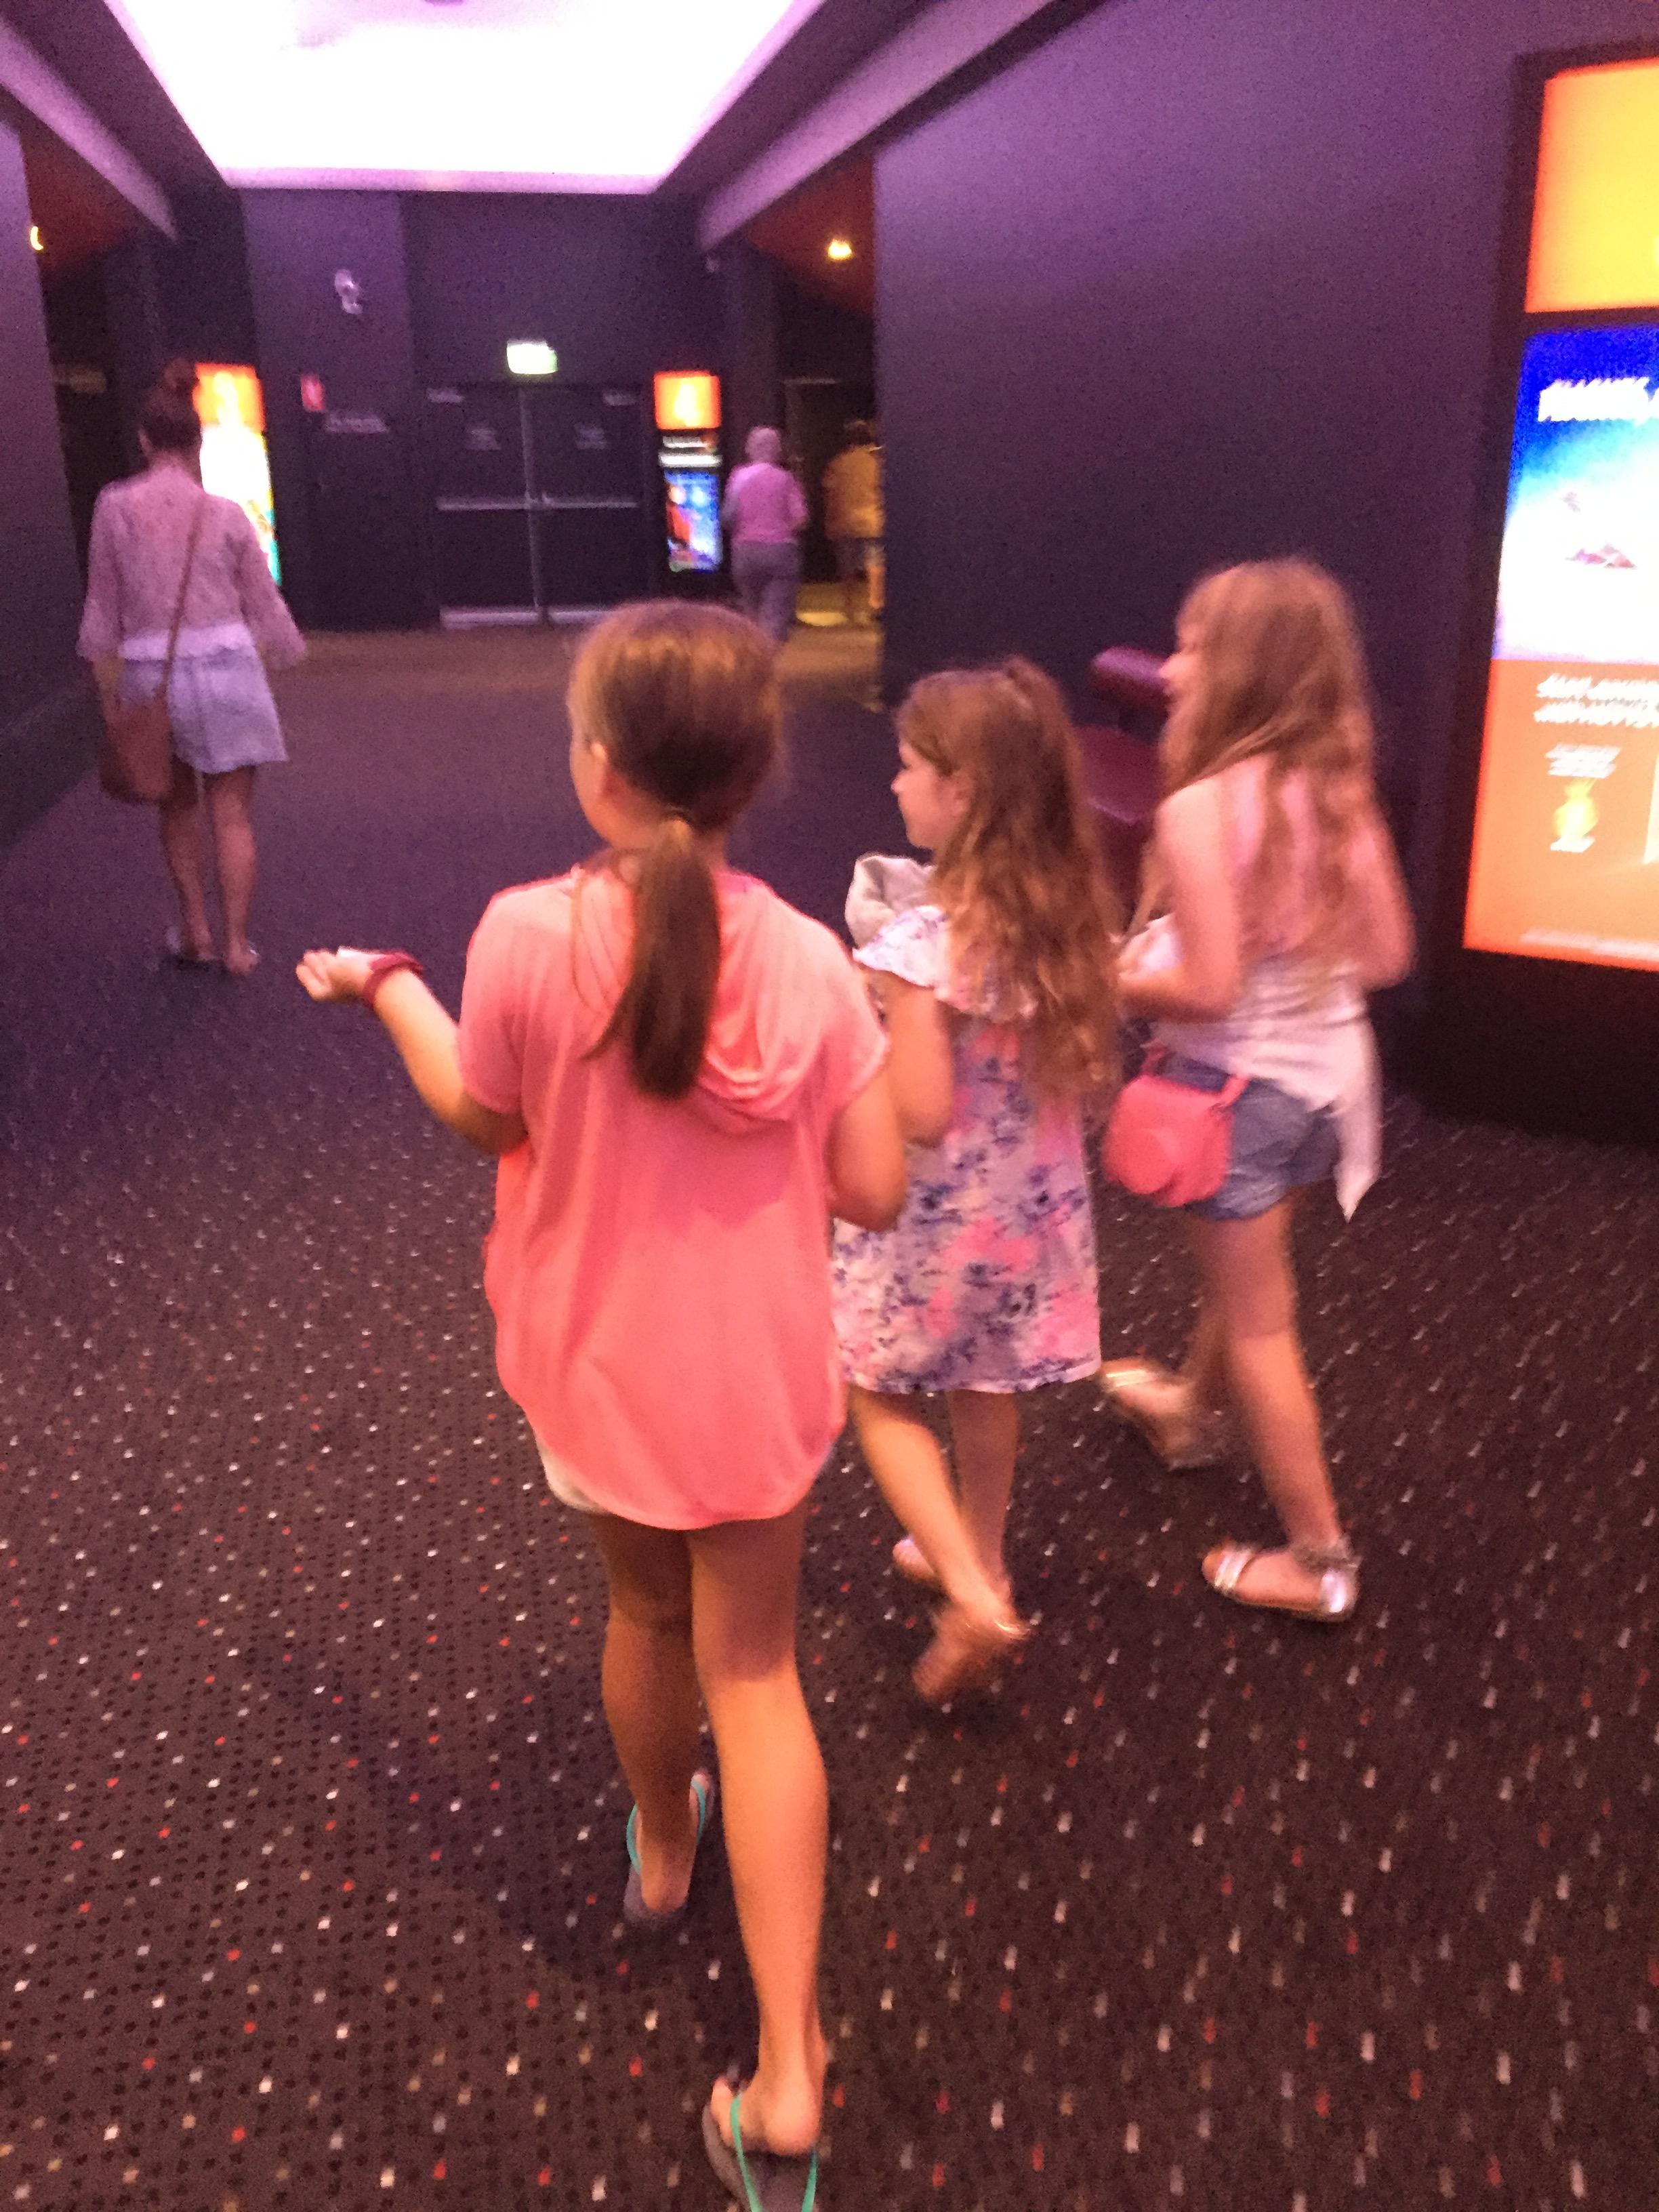 Hoyts Cinema Tweed Heads, NSW Australia